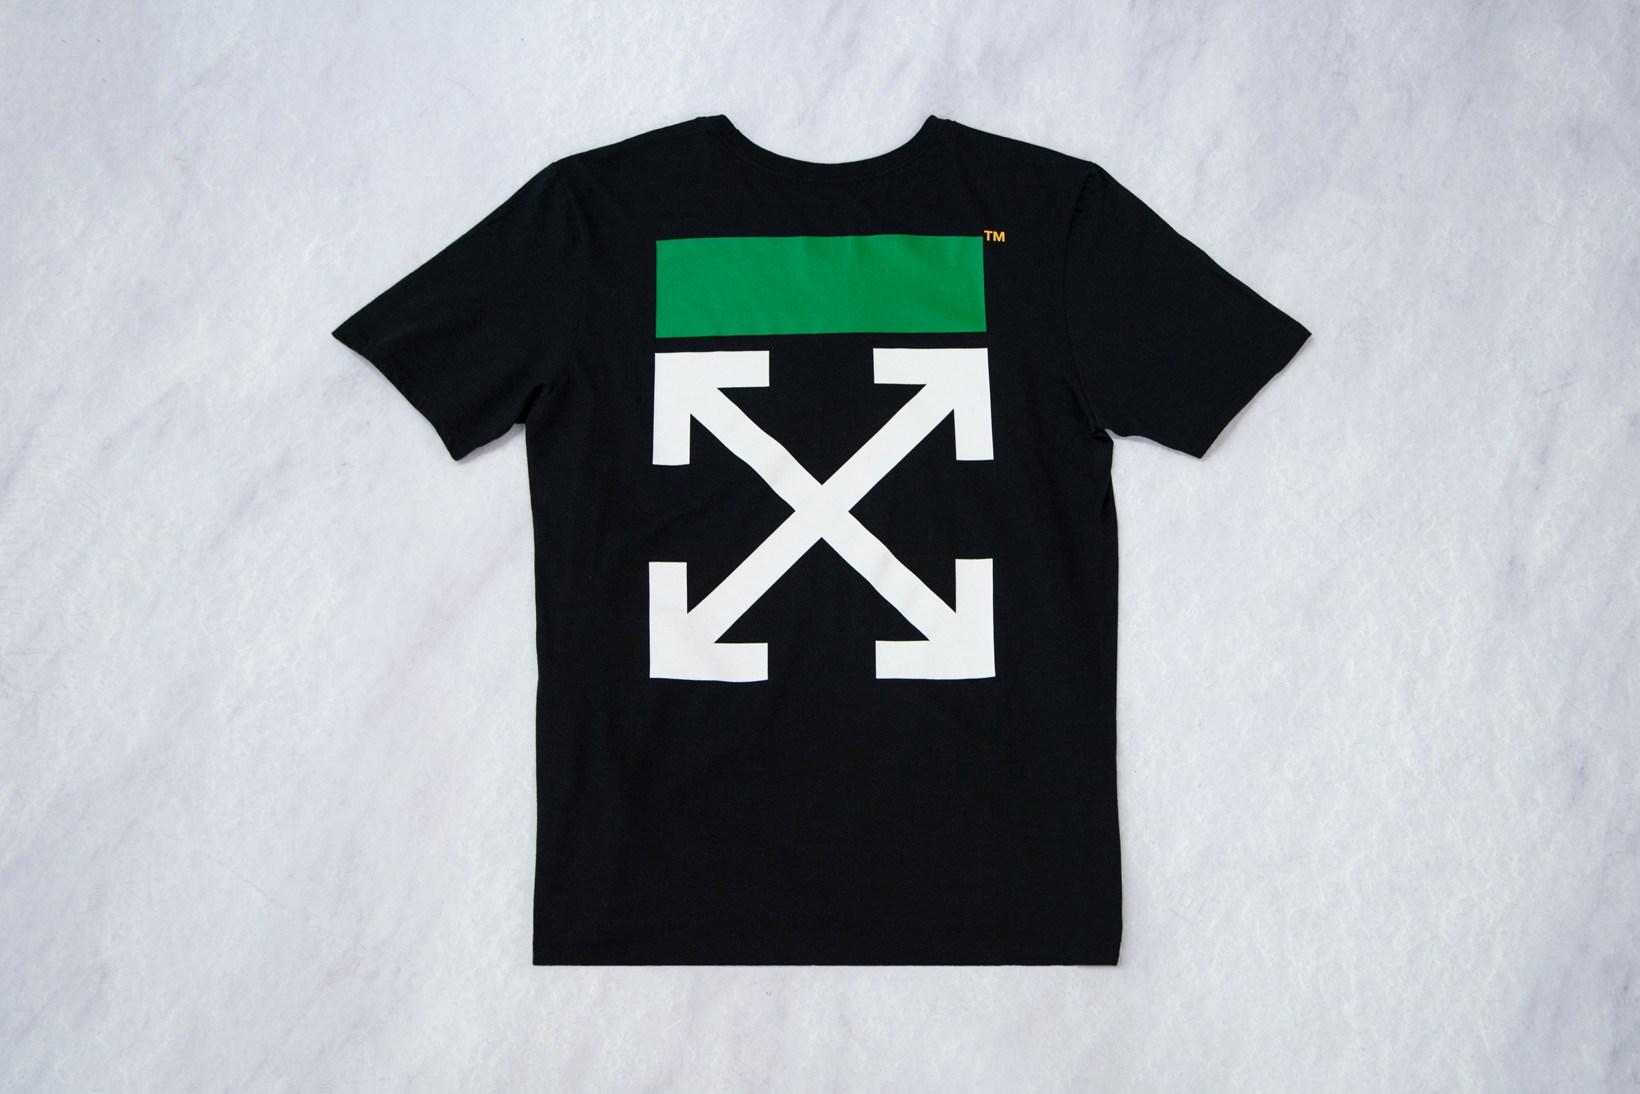 nike-off-white-virgil-abloh-equality-t-shirt-6